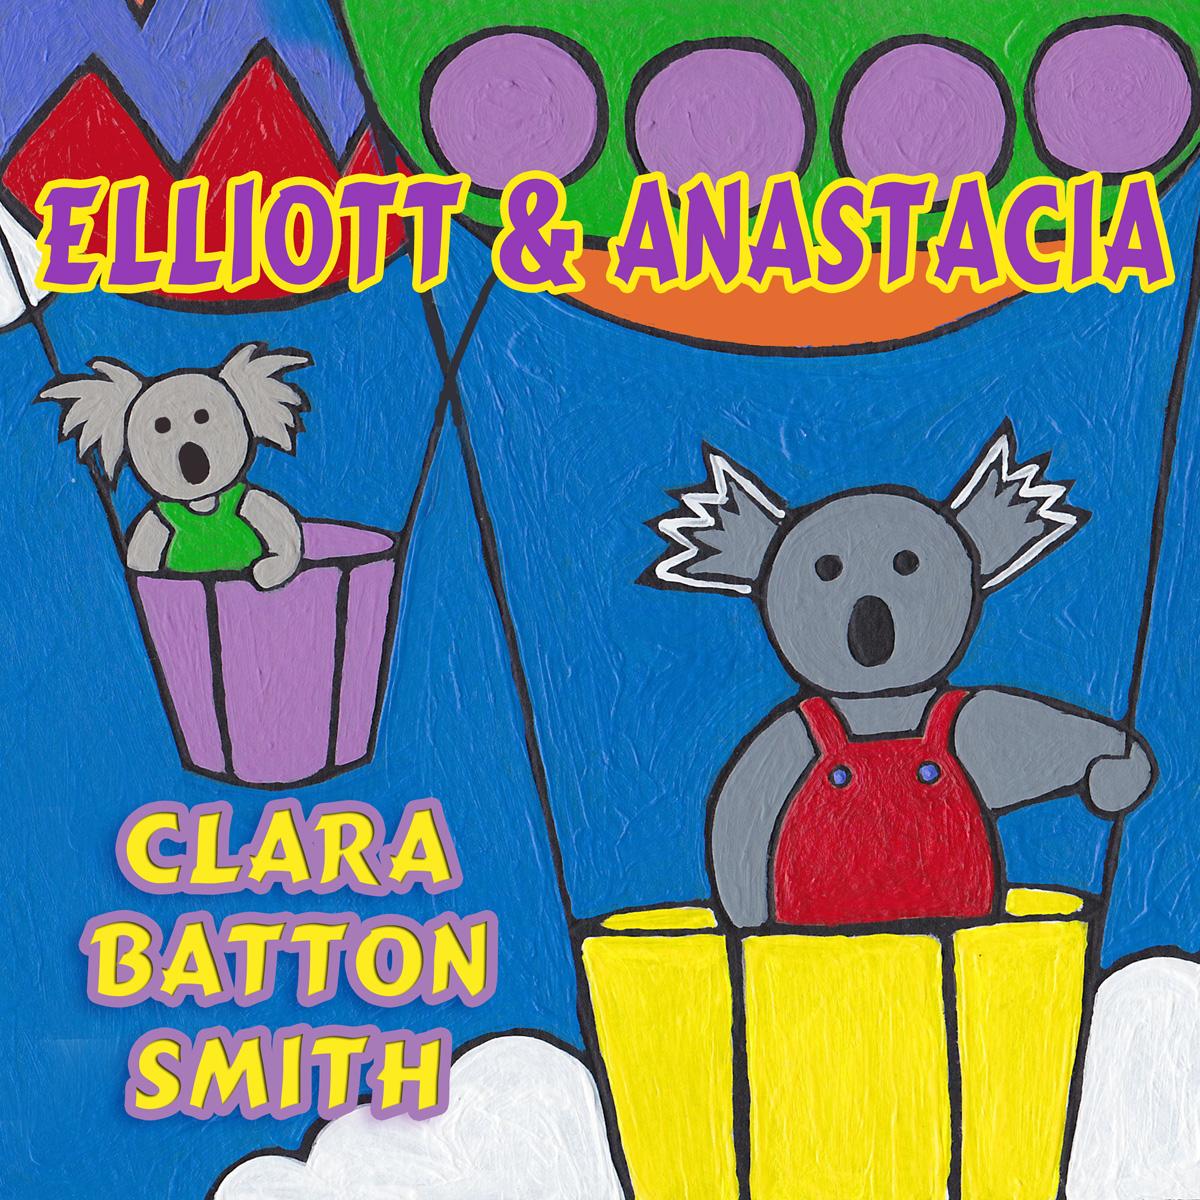 http://3.bp.blogspot.com/-Wo1MtnTCi6k/T9ieMdBsKYI/AAAAAAAAA5o/pss7Qtt4890/s1600/Elliot+&+Anastacia.jpg